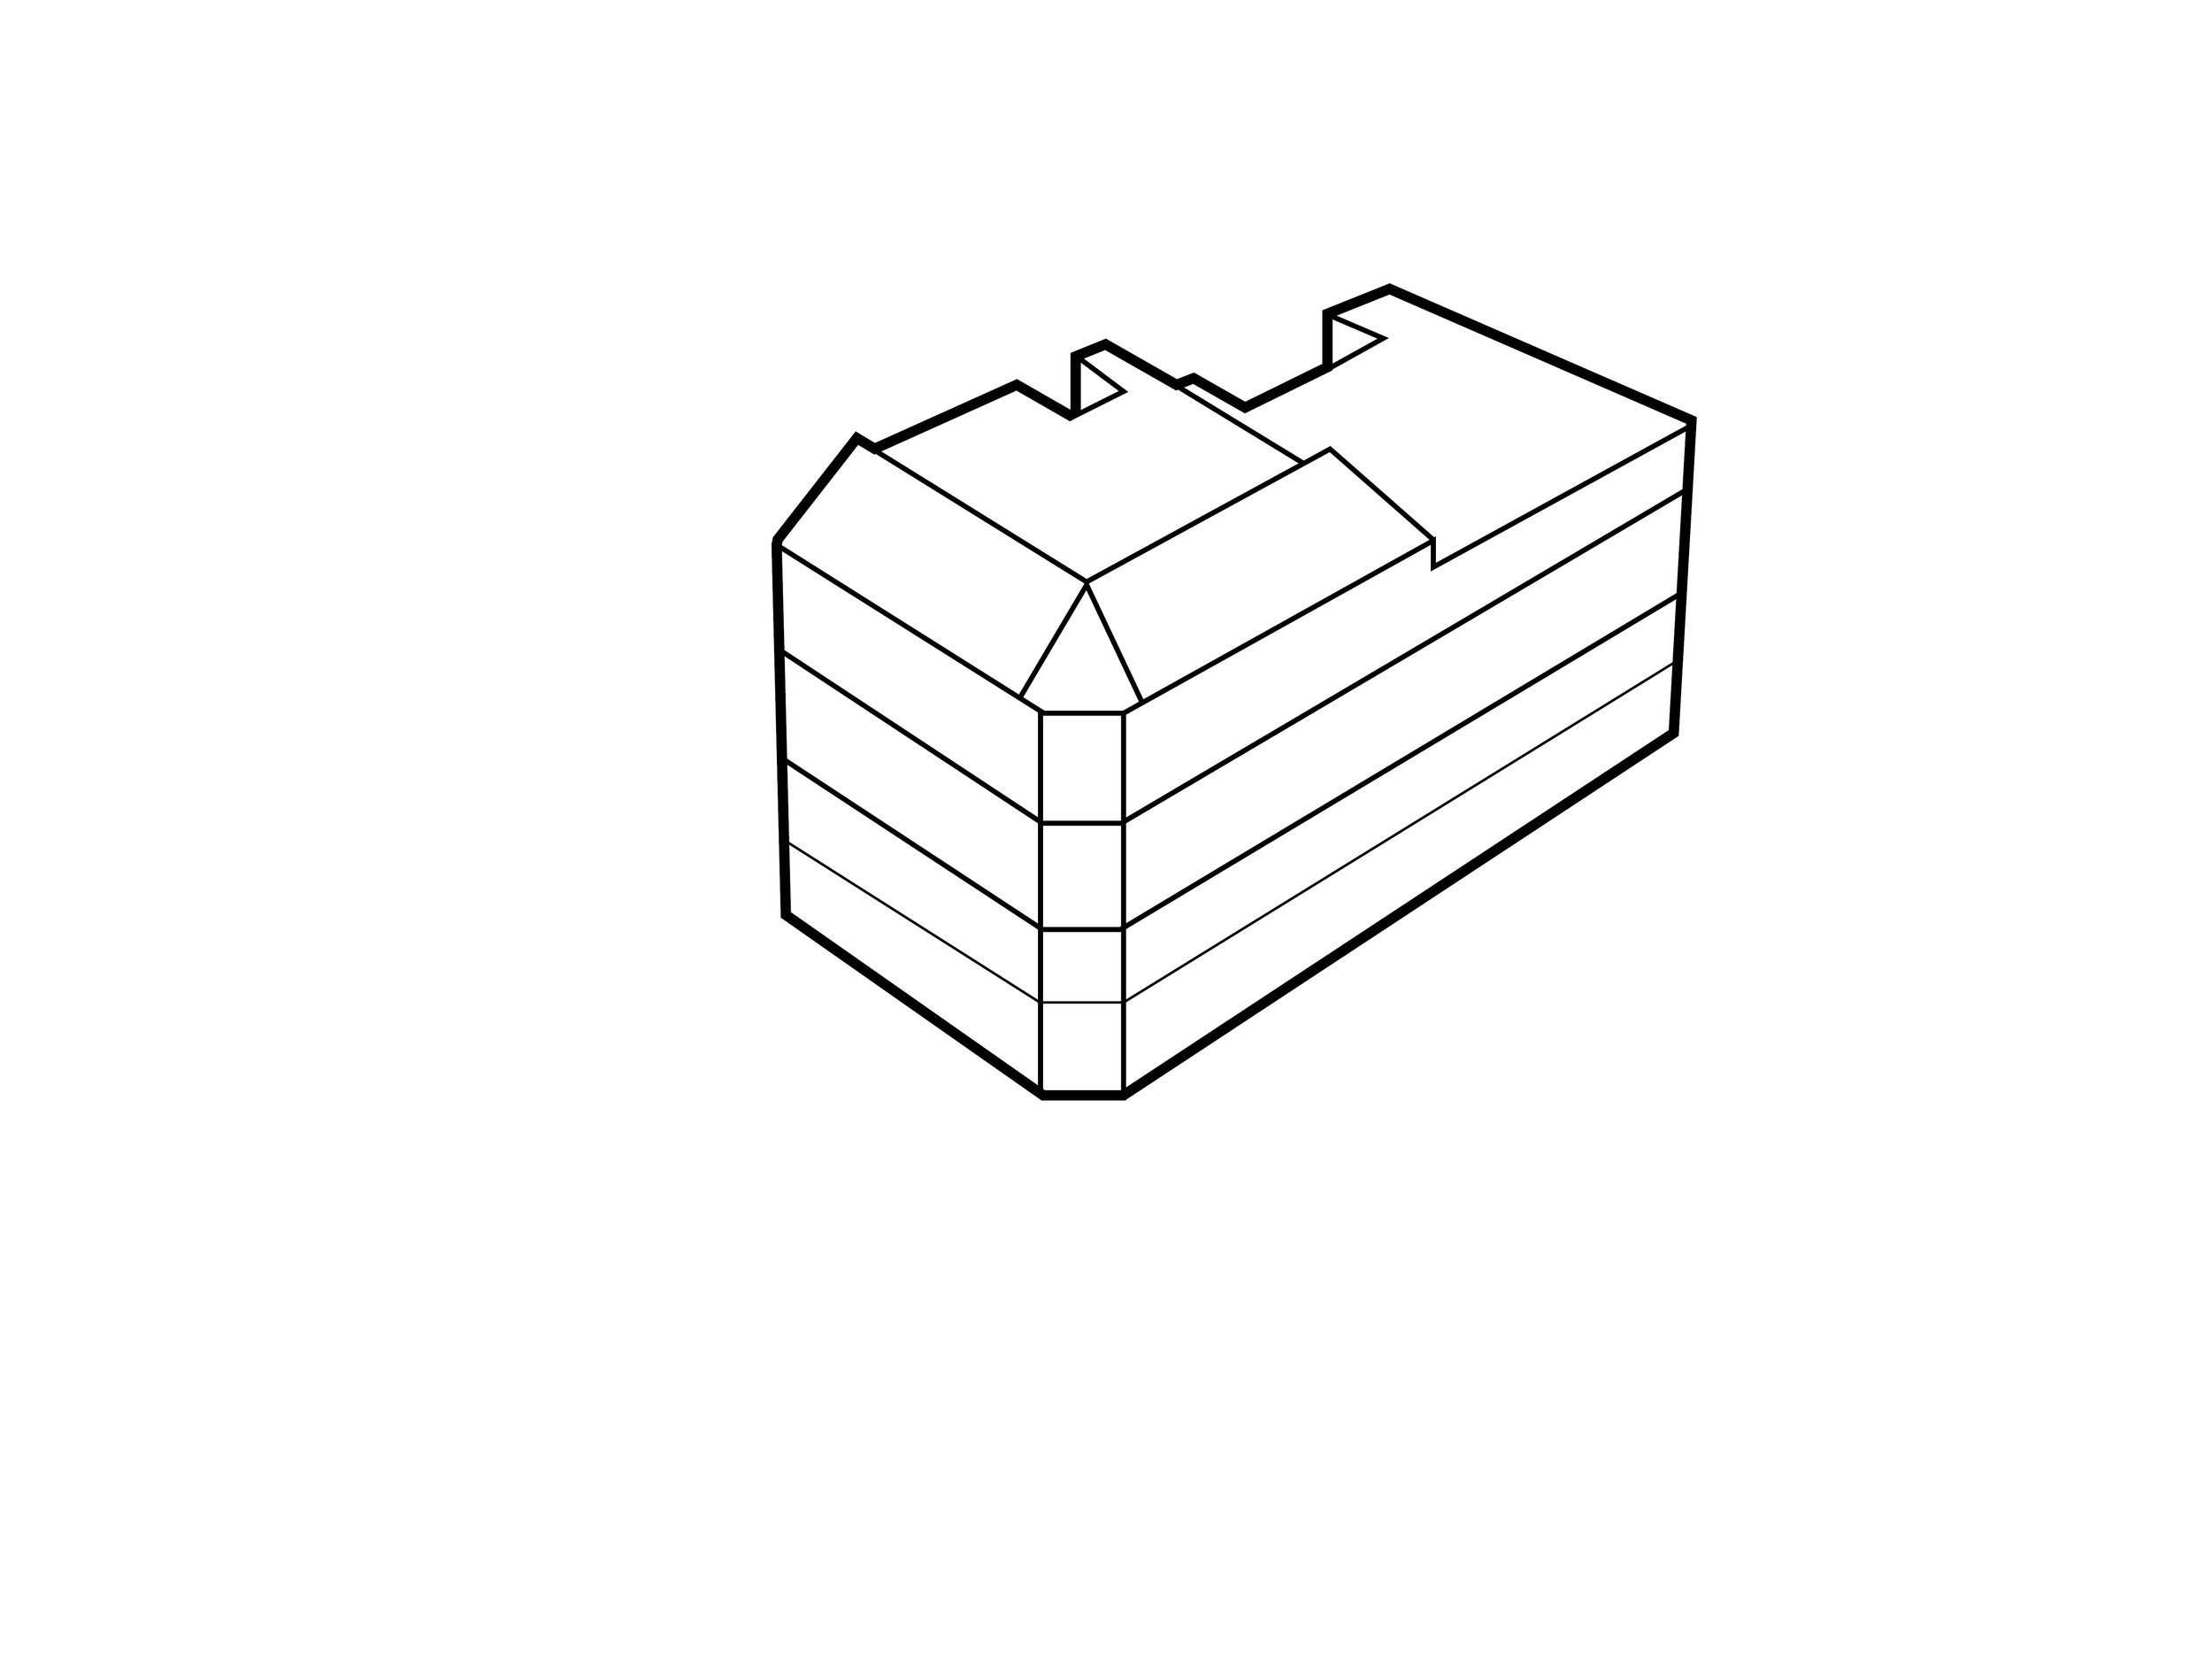 Personal-Architecture-rotterdam-wam-17.jpg